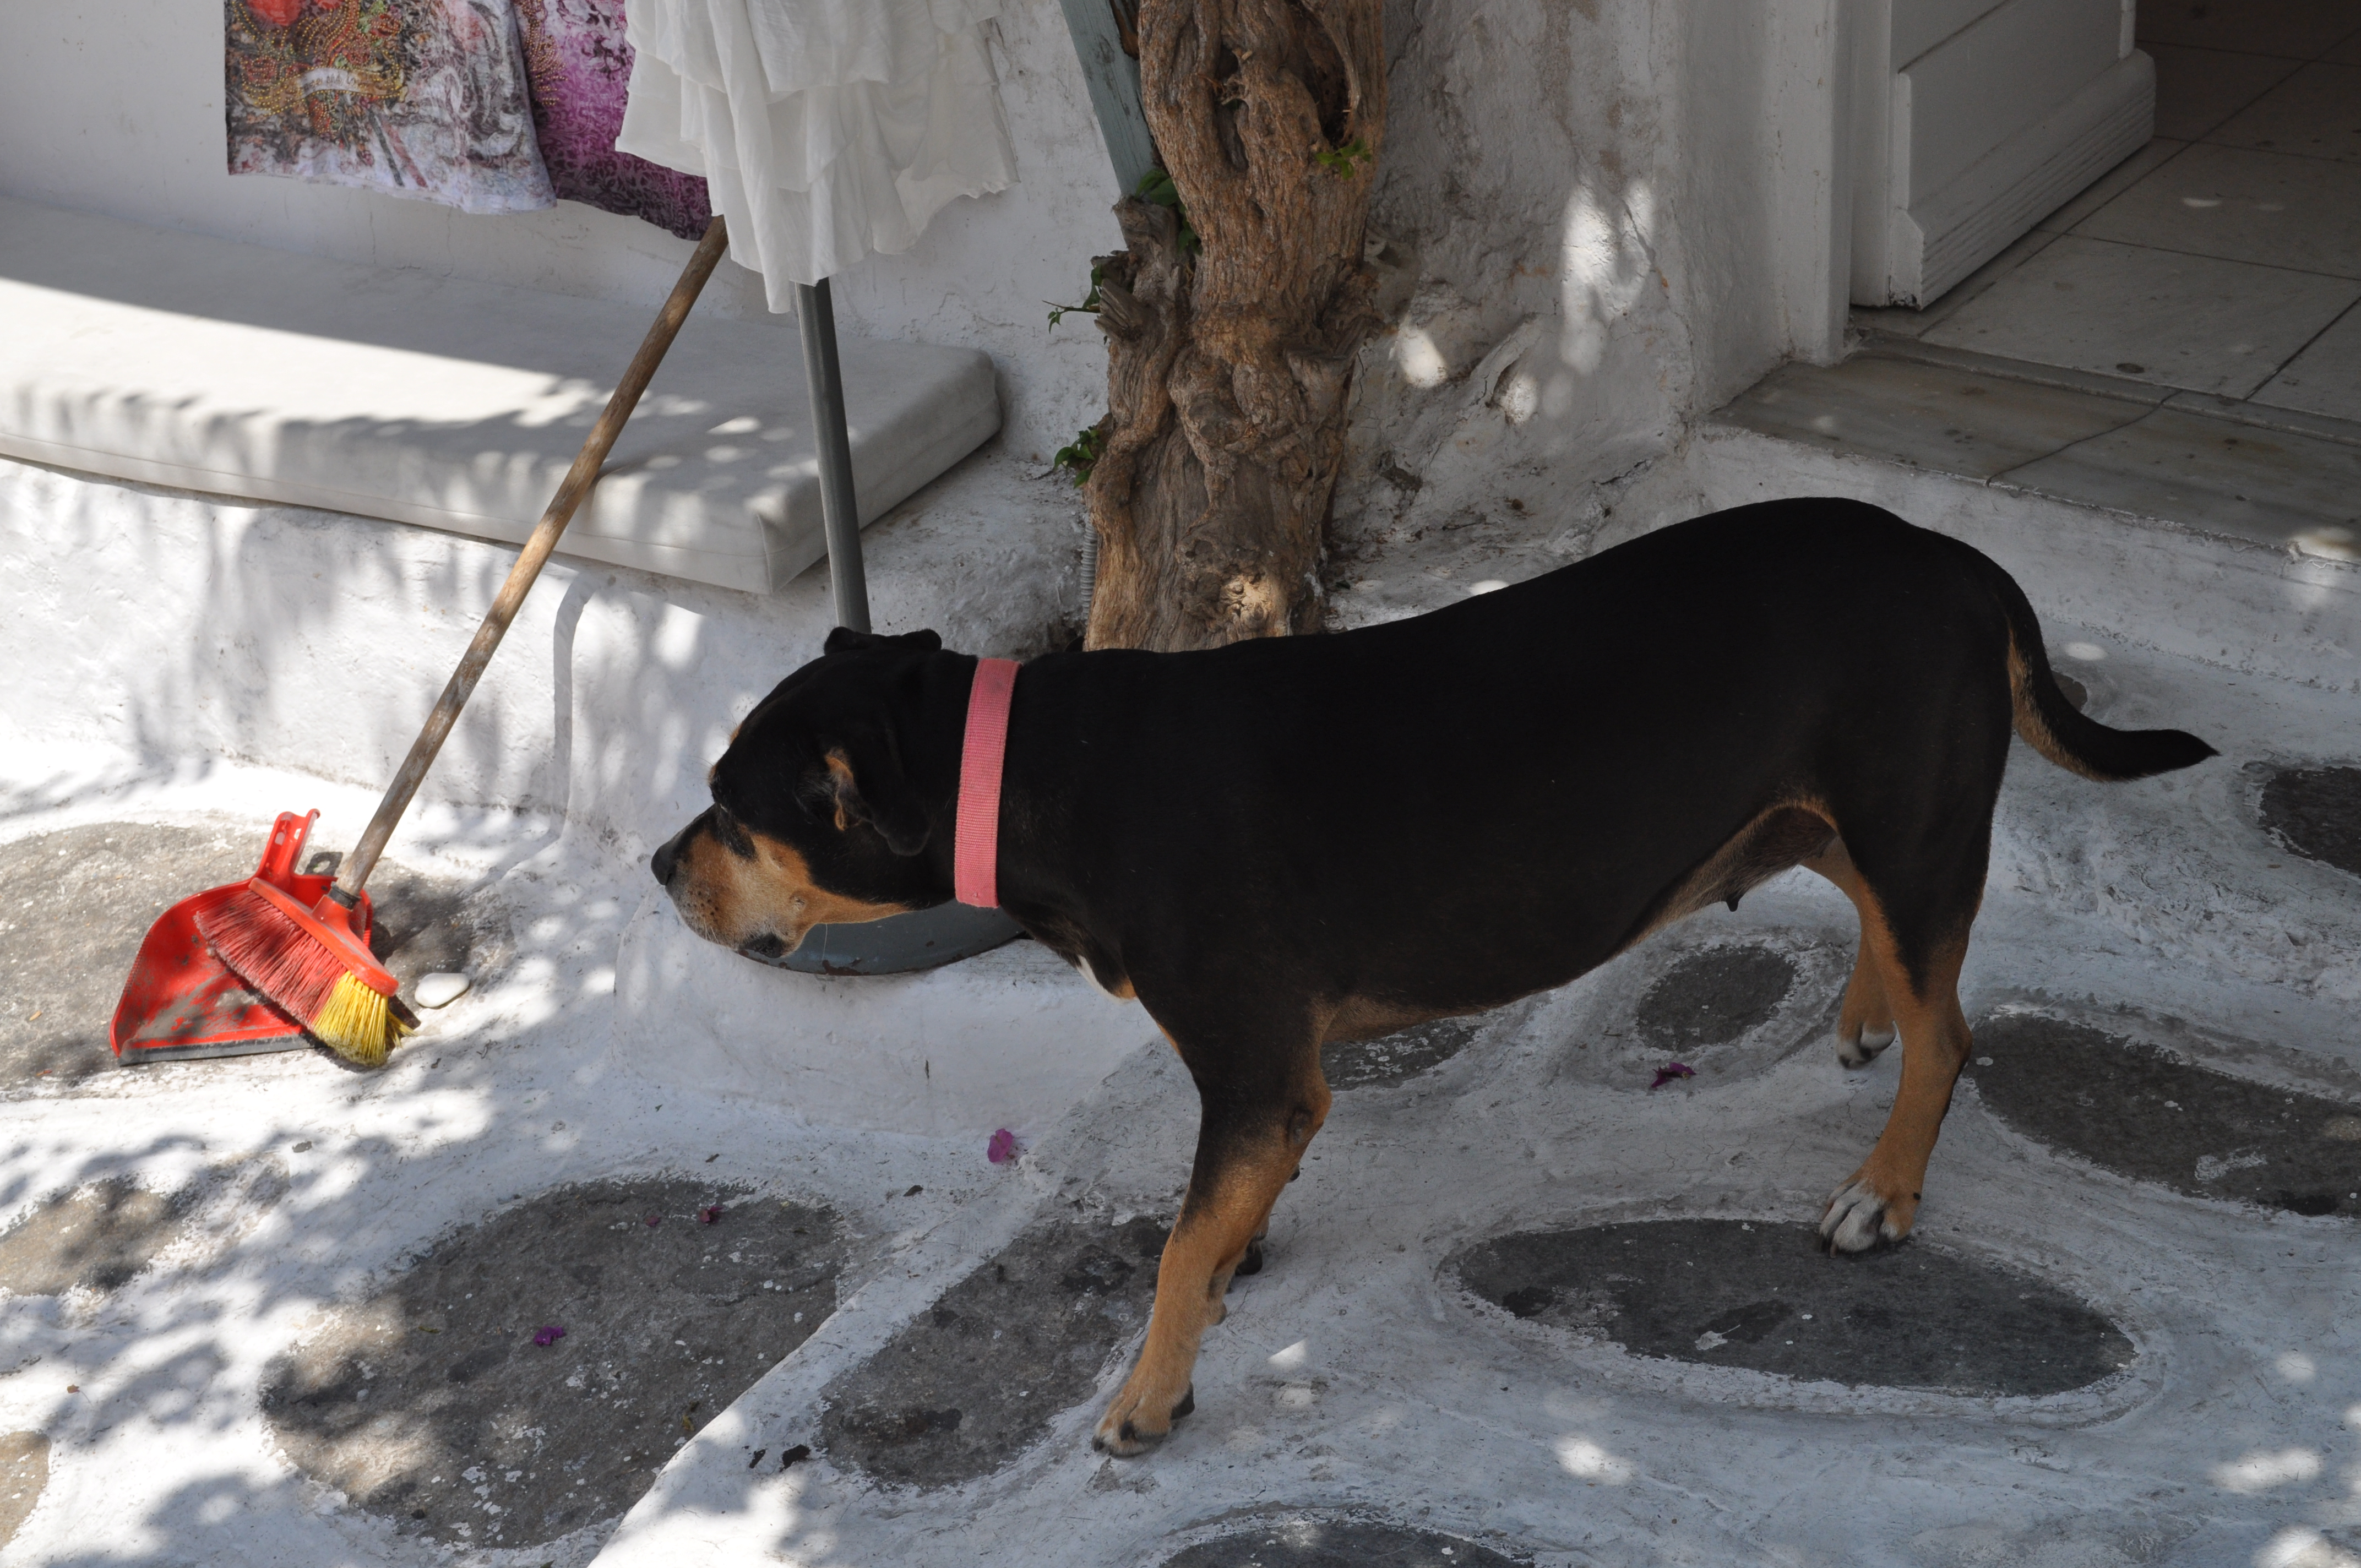 Siberian Husky RottweilerSiberian Husky Rottweiler Mix